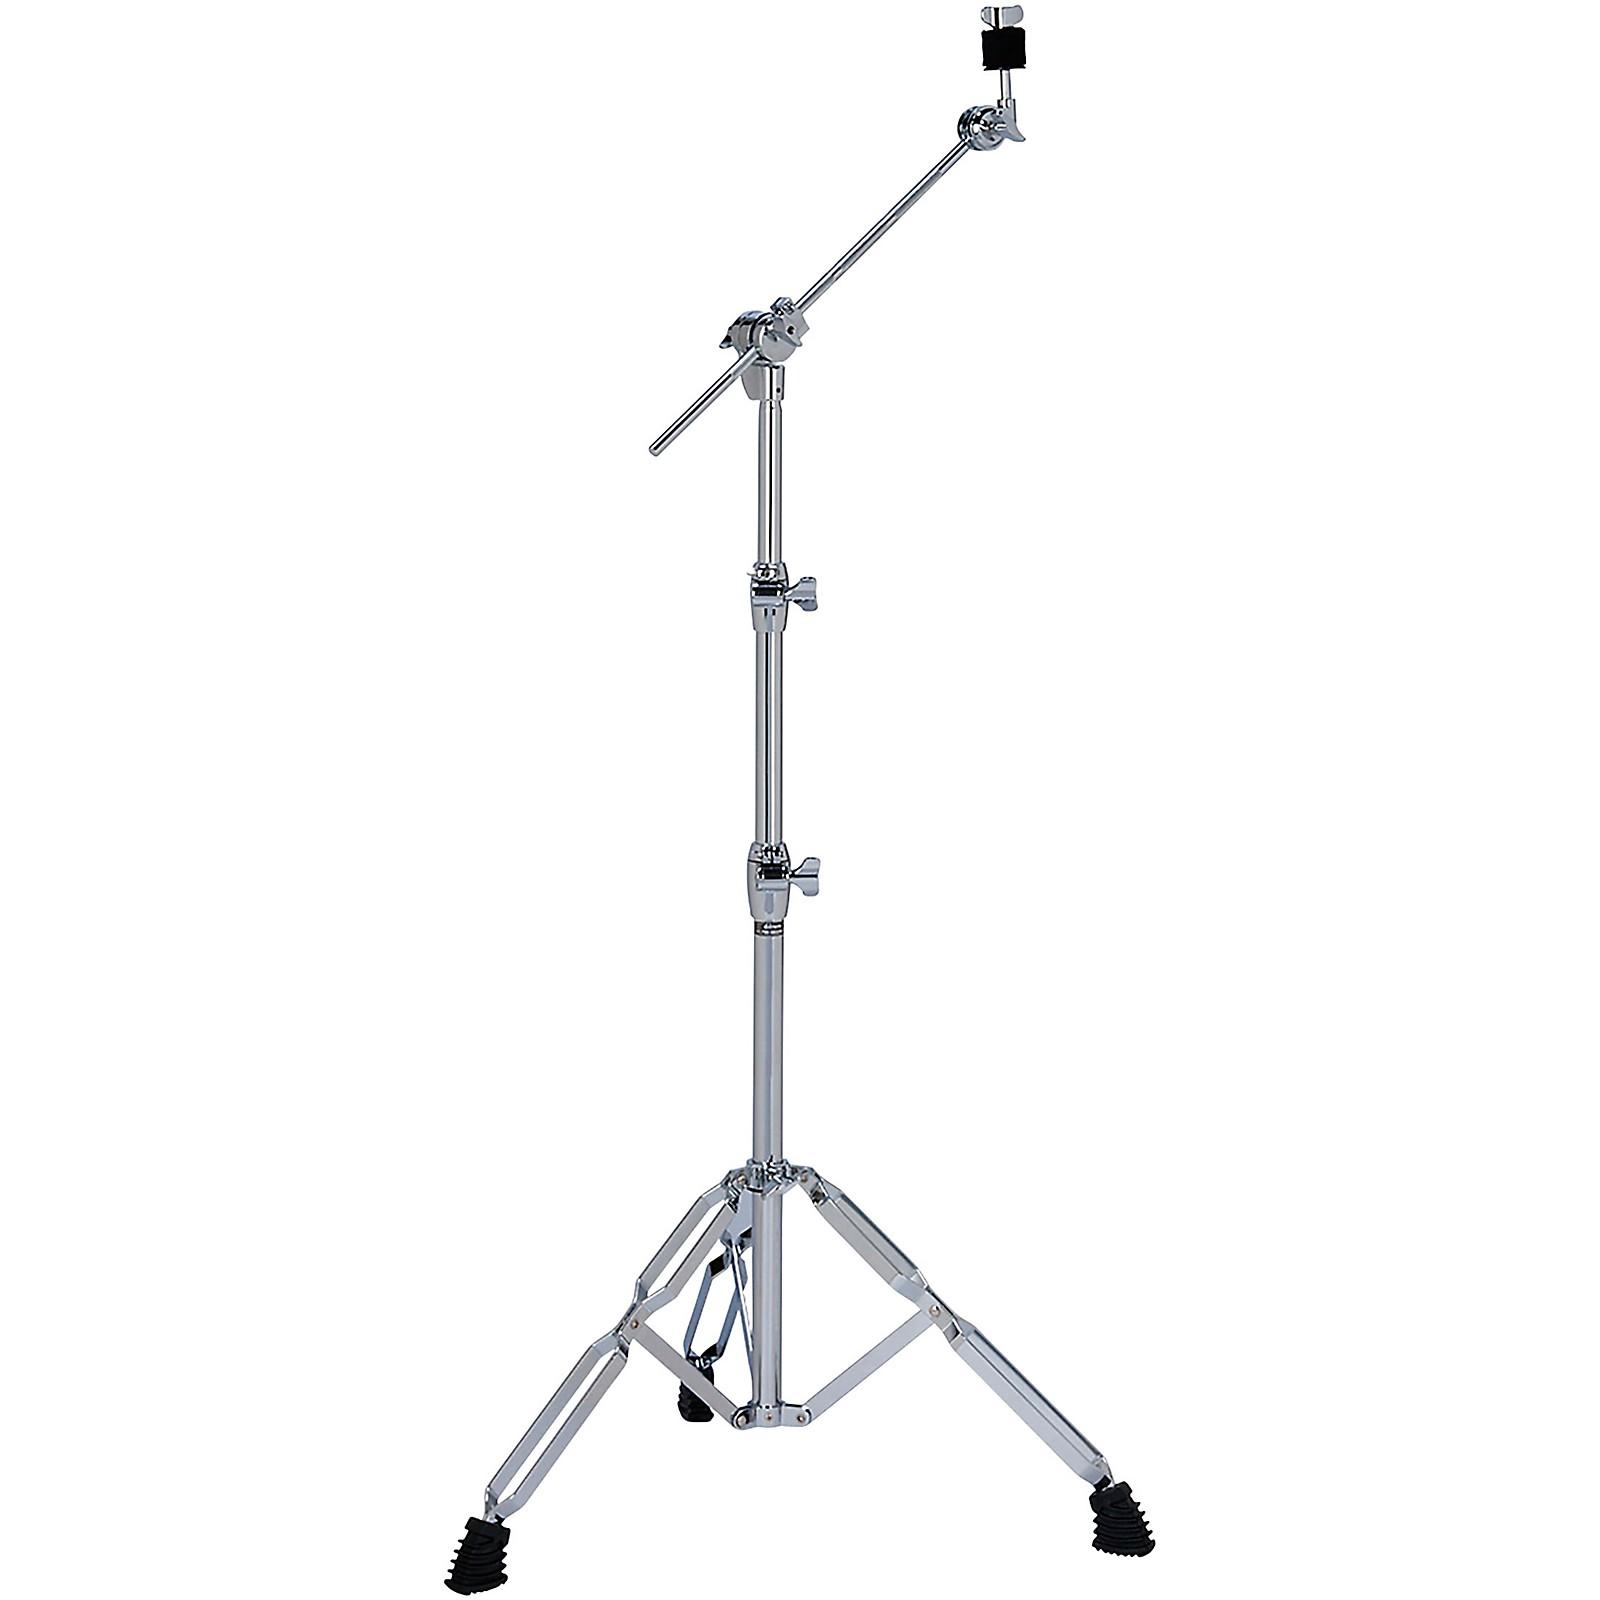 ddrum RX Series Pro Boom Stand